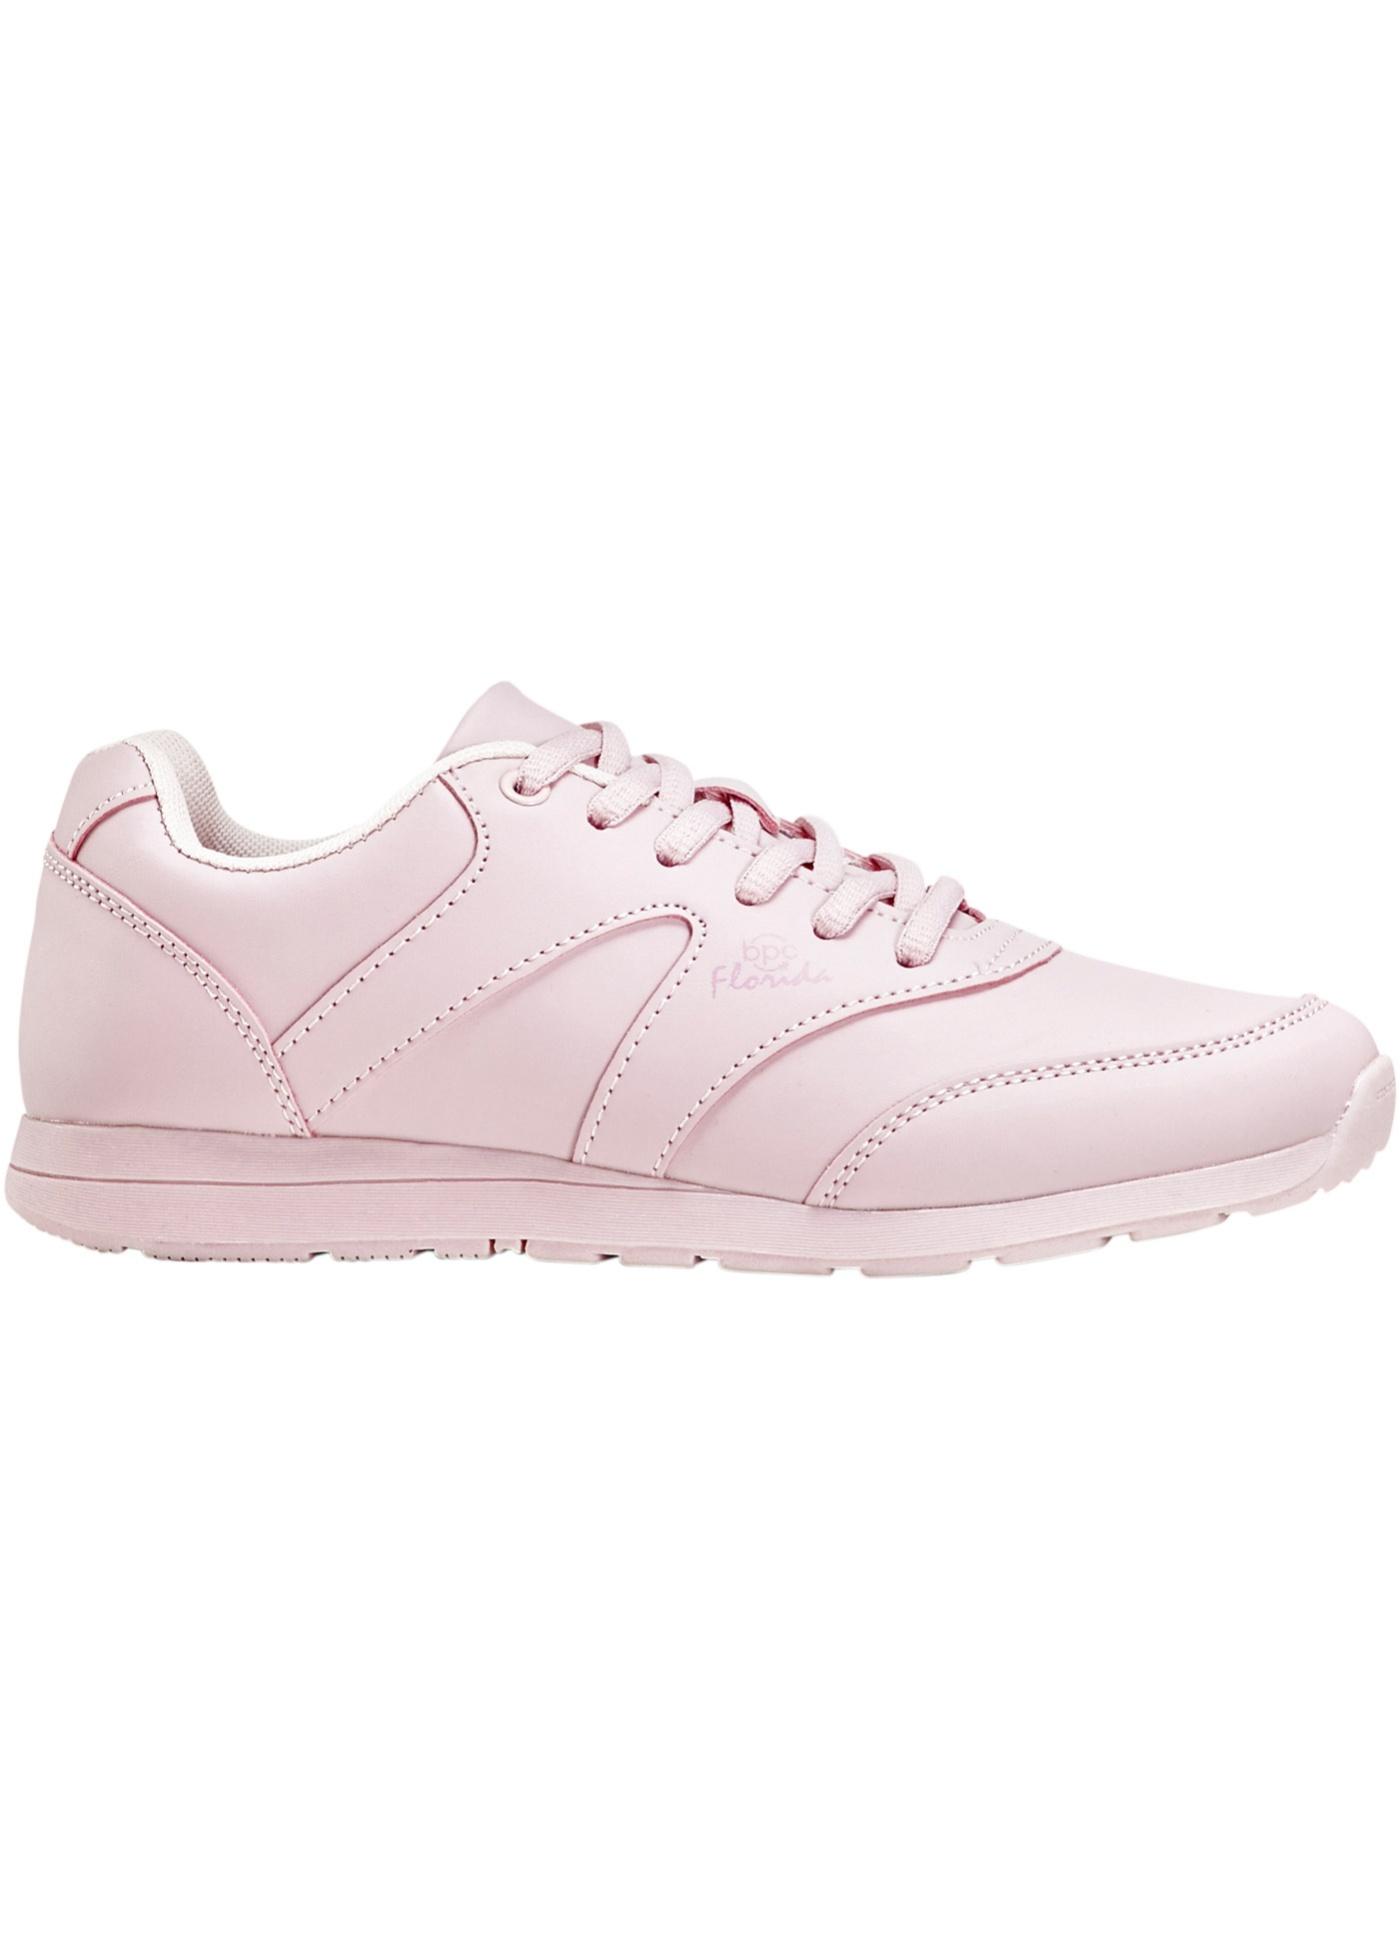 Sneakers, bpc bonprix collection